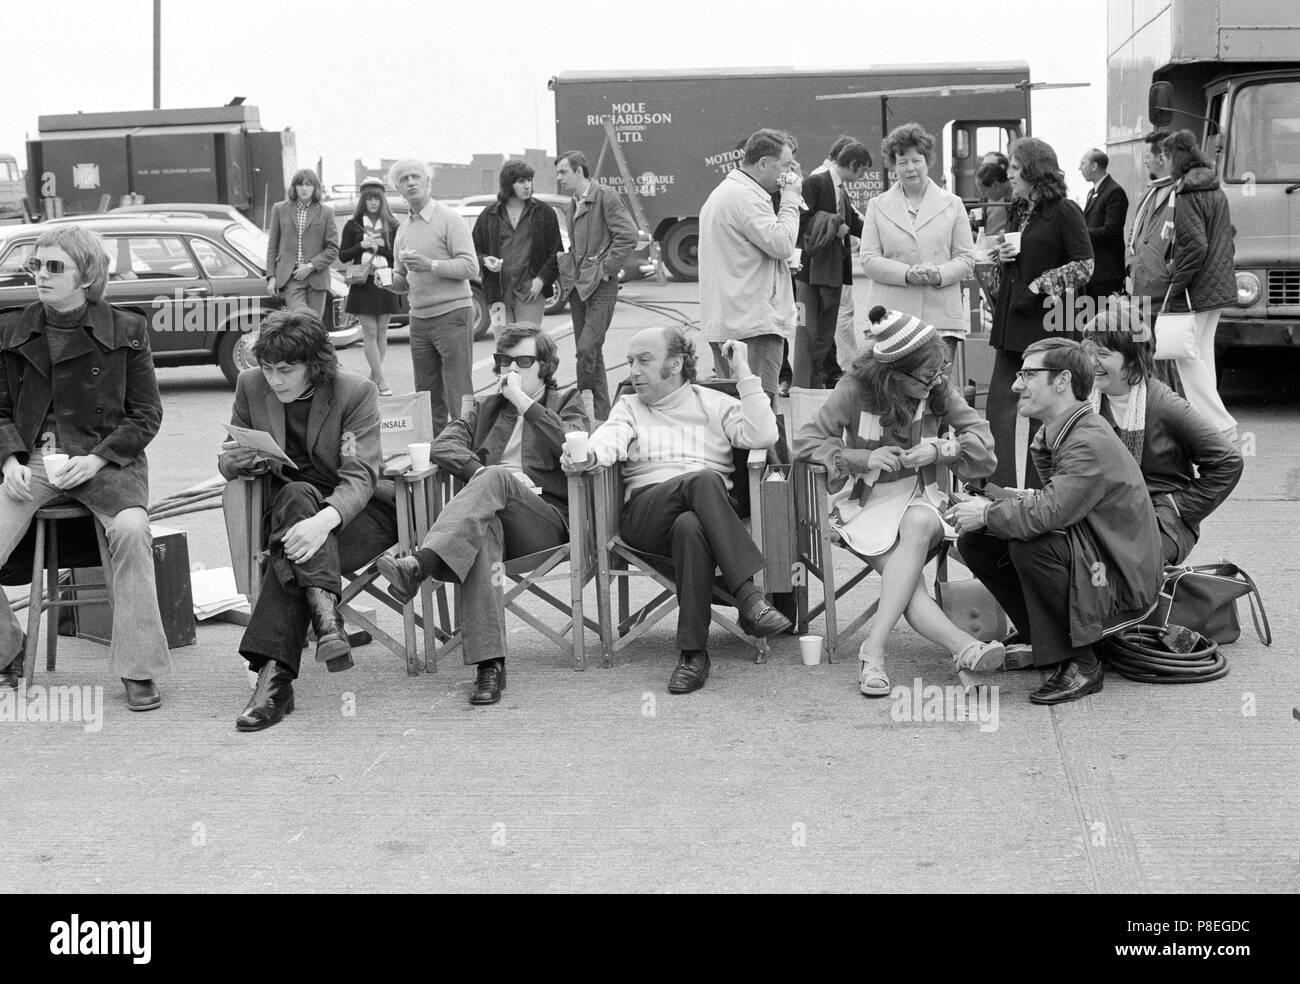 The Lovers (1973) Paula Wilcox, Richard Beckinsale, Film Director Herbert Wise,     Date: 1973 - Stock Image